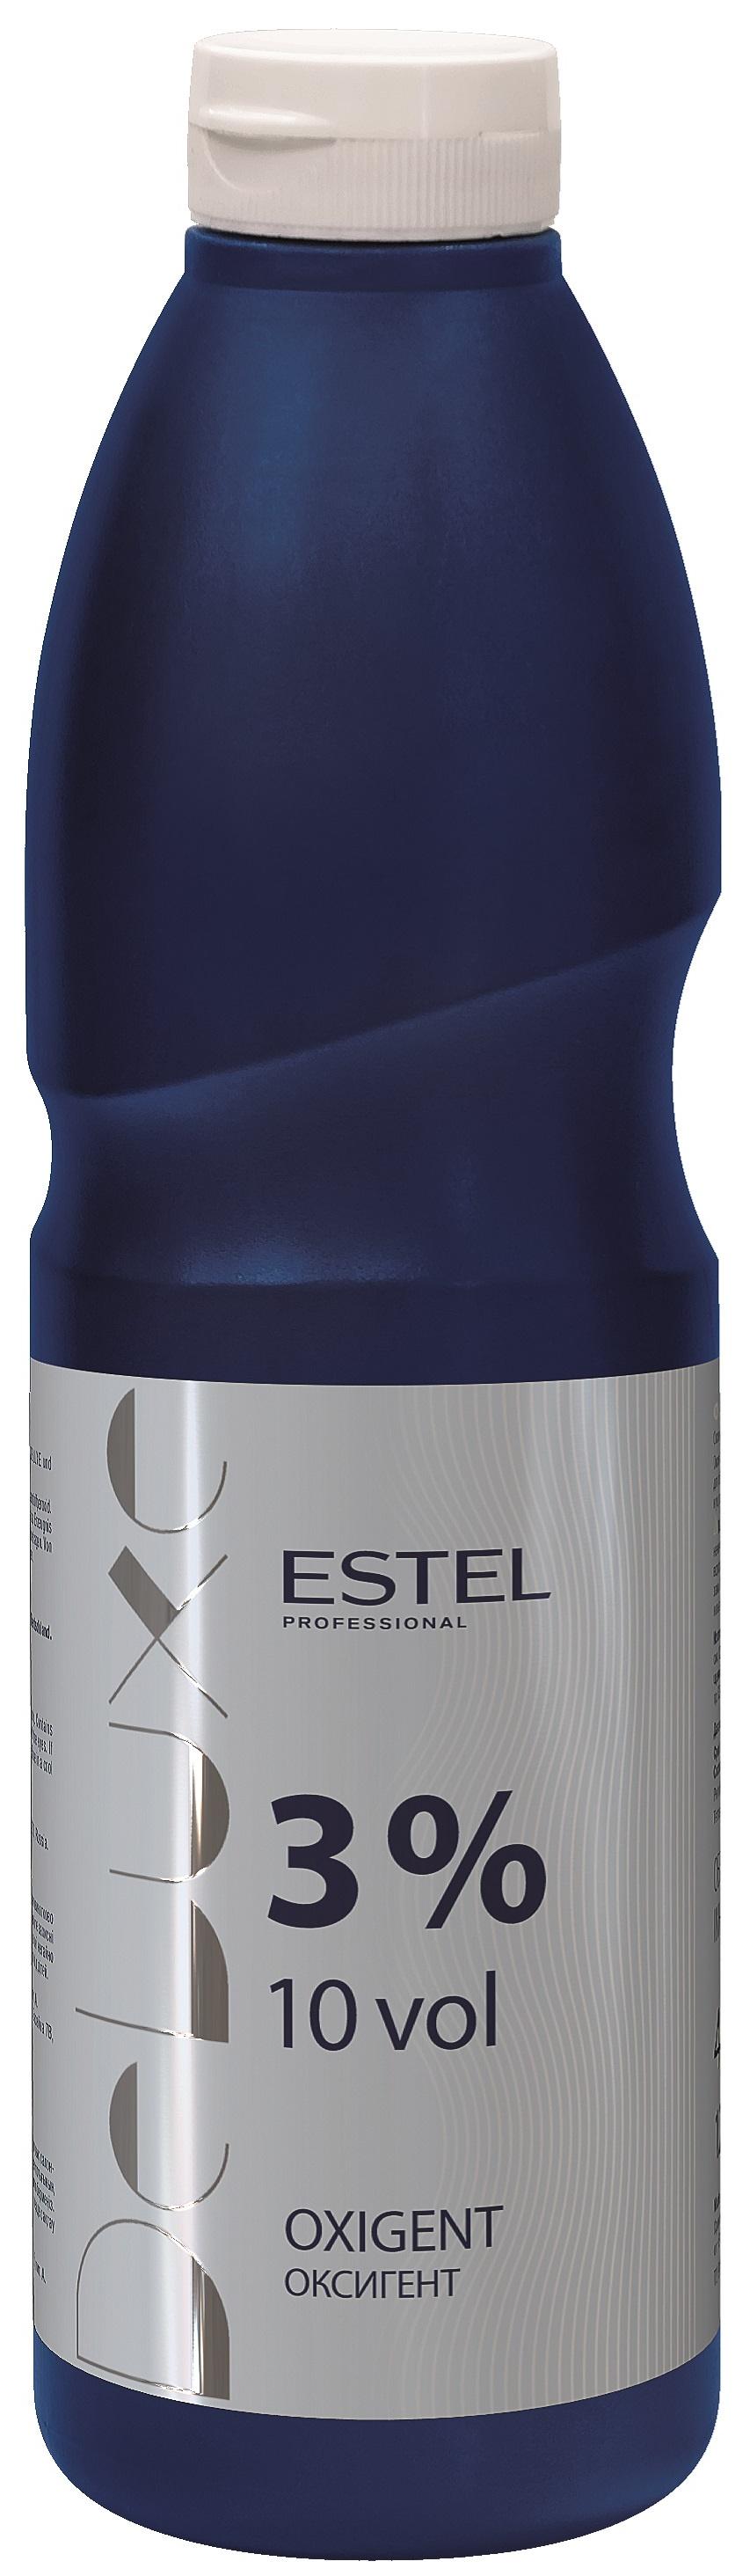 Окислитель ESTEL PROFESSIONAL оксигент DE LUXE 3 процента 900 мл